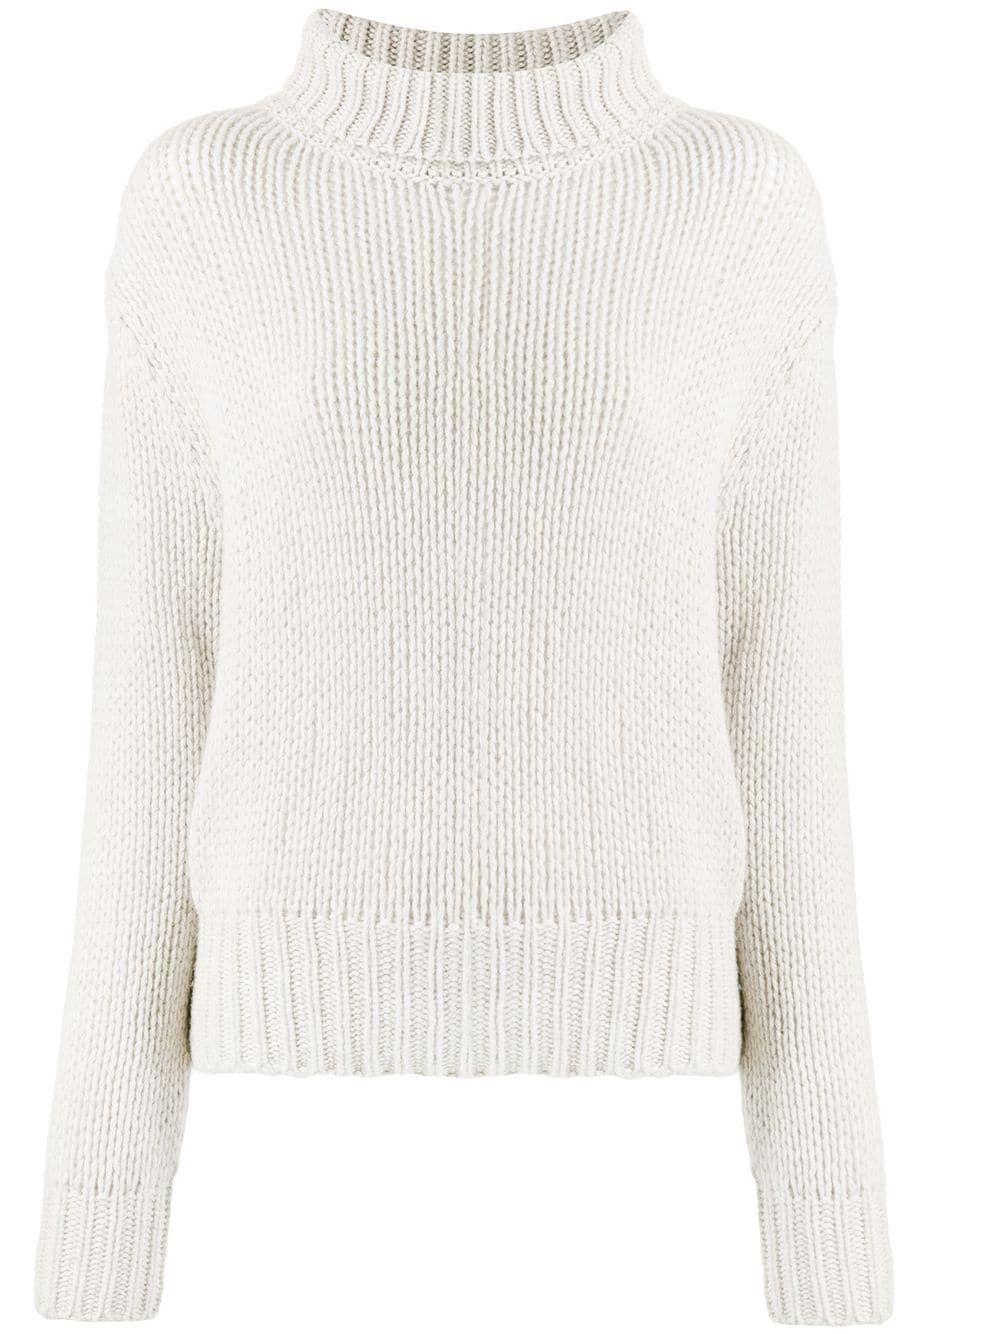 Aragona chunky knit jumper - White #chunkyknitjumper